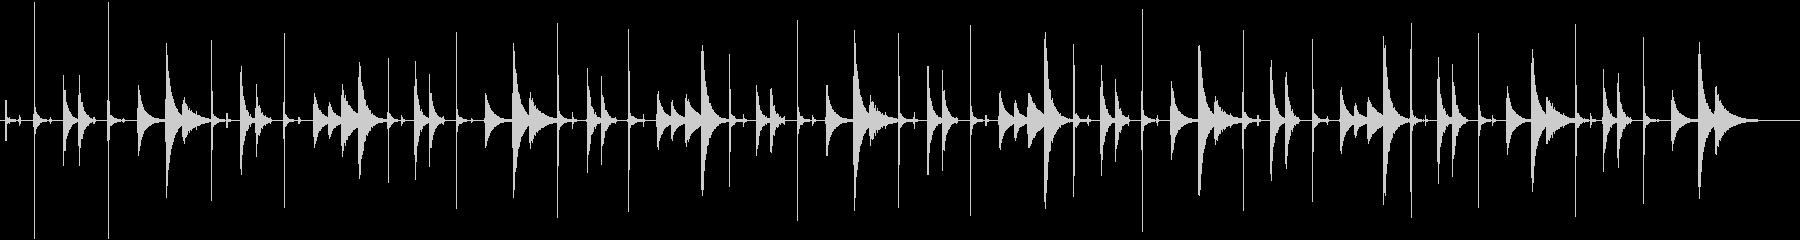 Guanguanco:アフロキュー...の未再生の波形